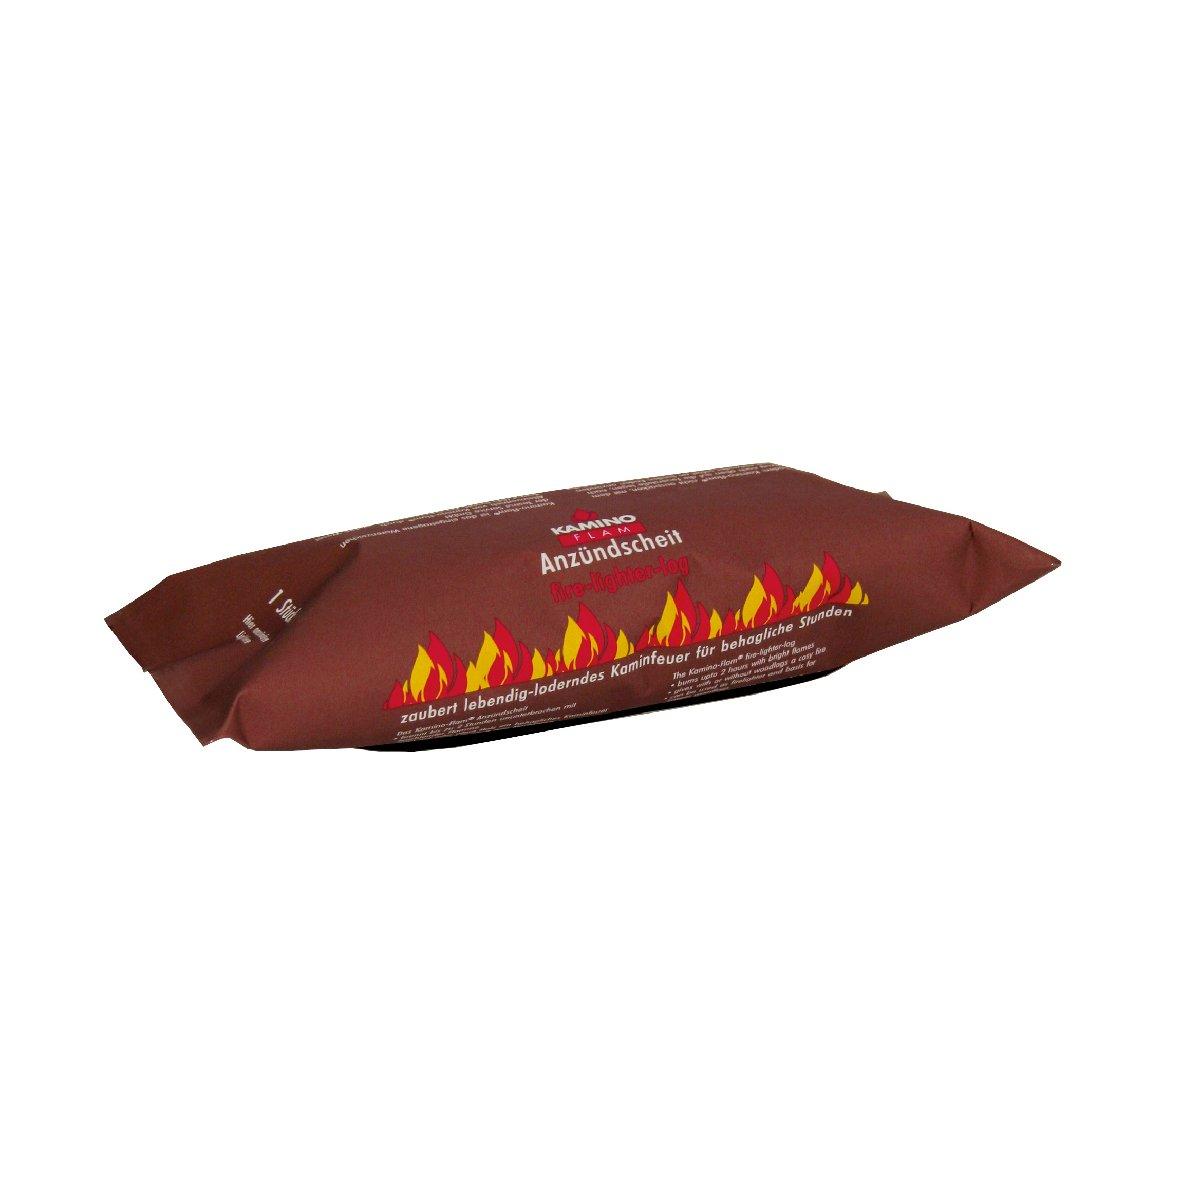 Kamino-Flam 333150 Ceppo Accendifuoco Lunga Durata, Bianco, 23x23x13 cm Kamino - Flam